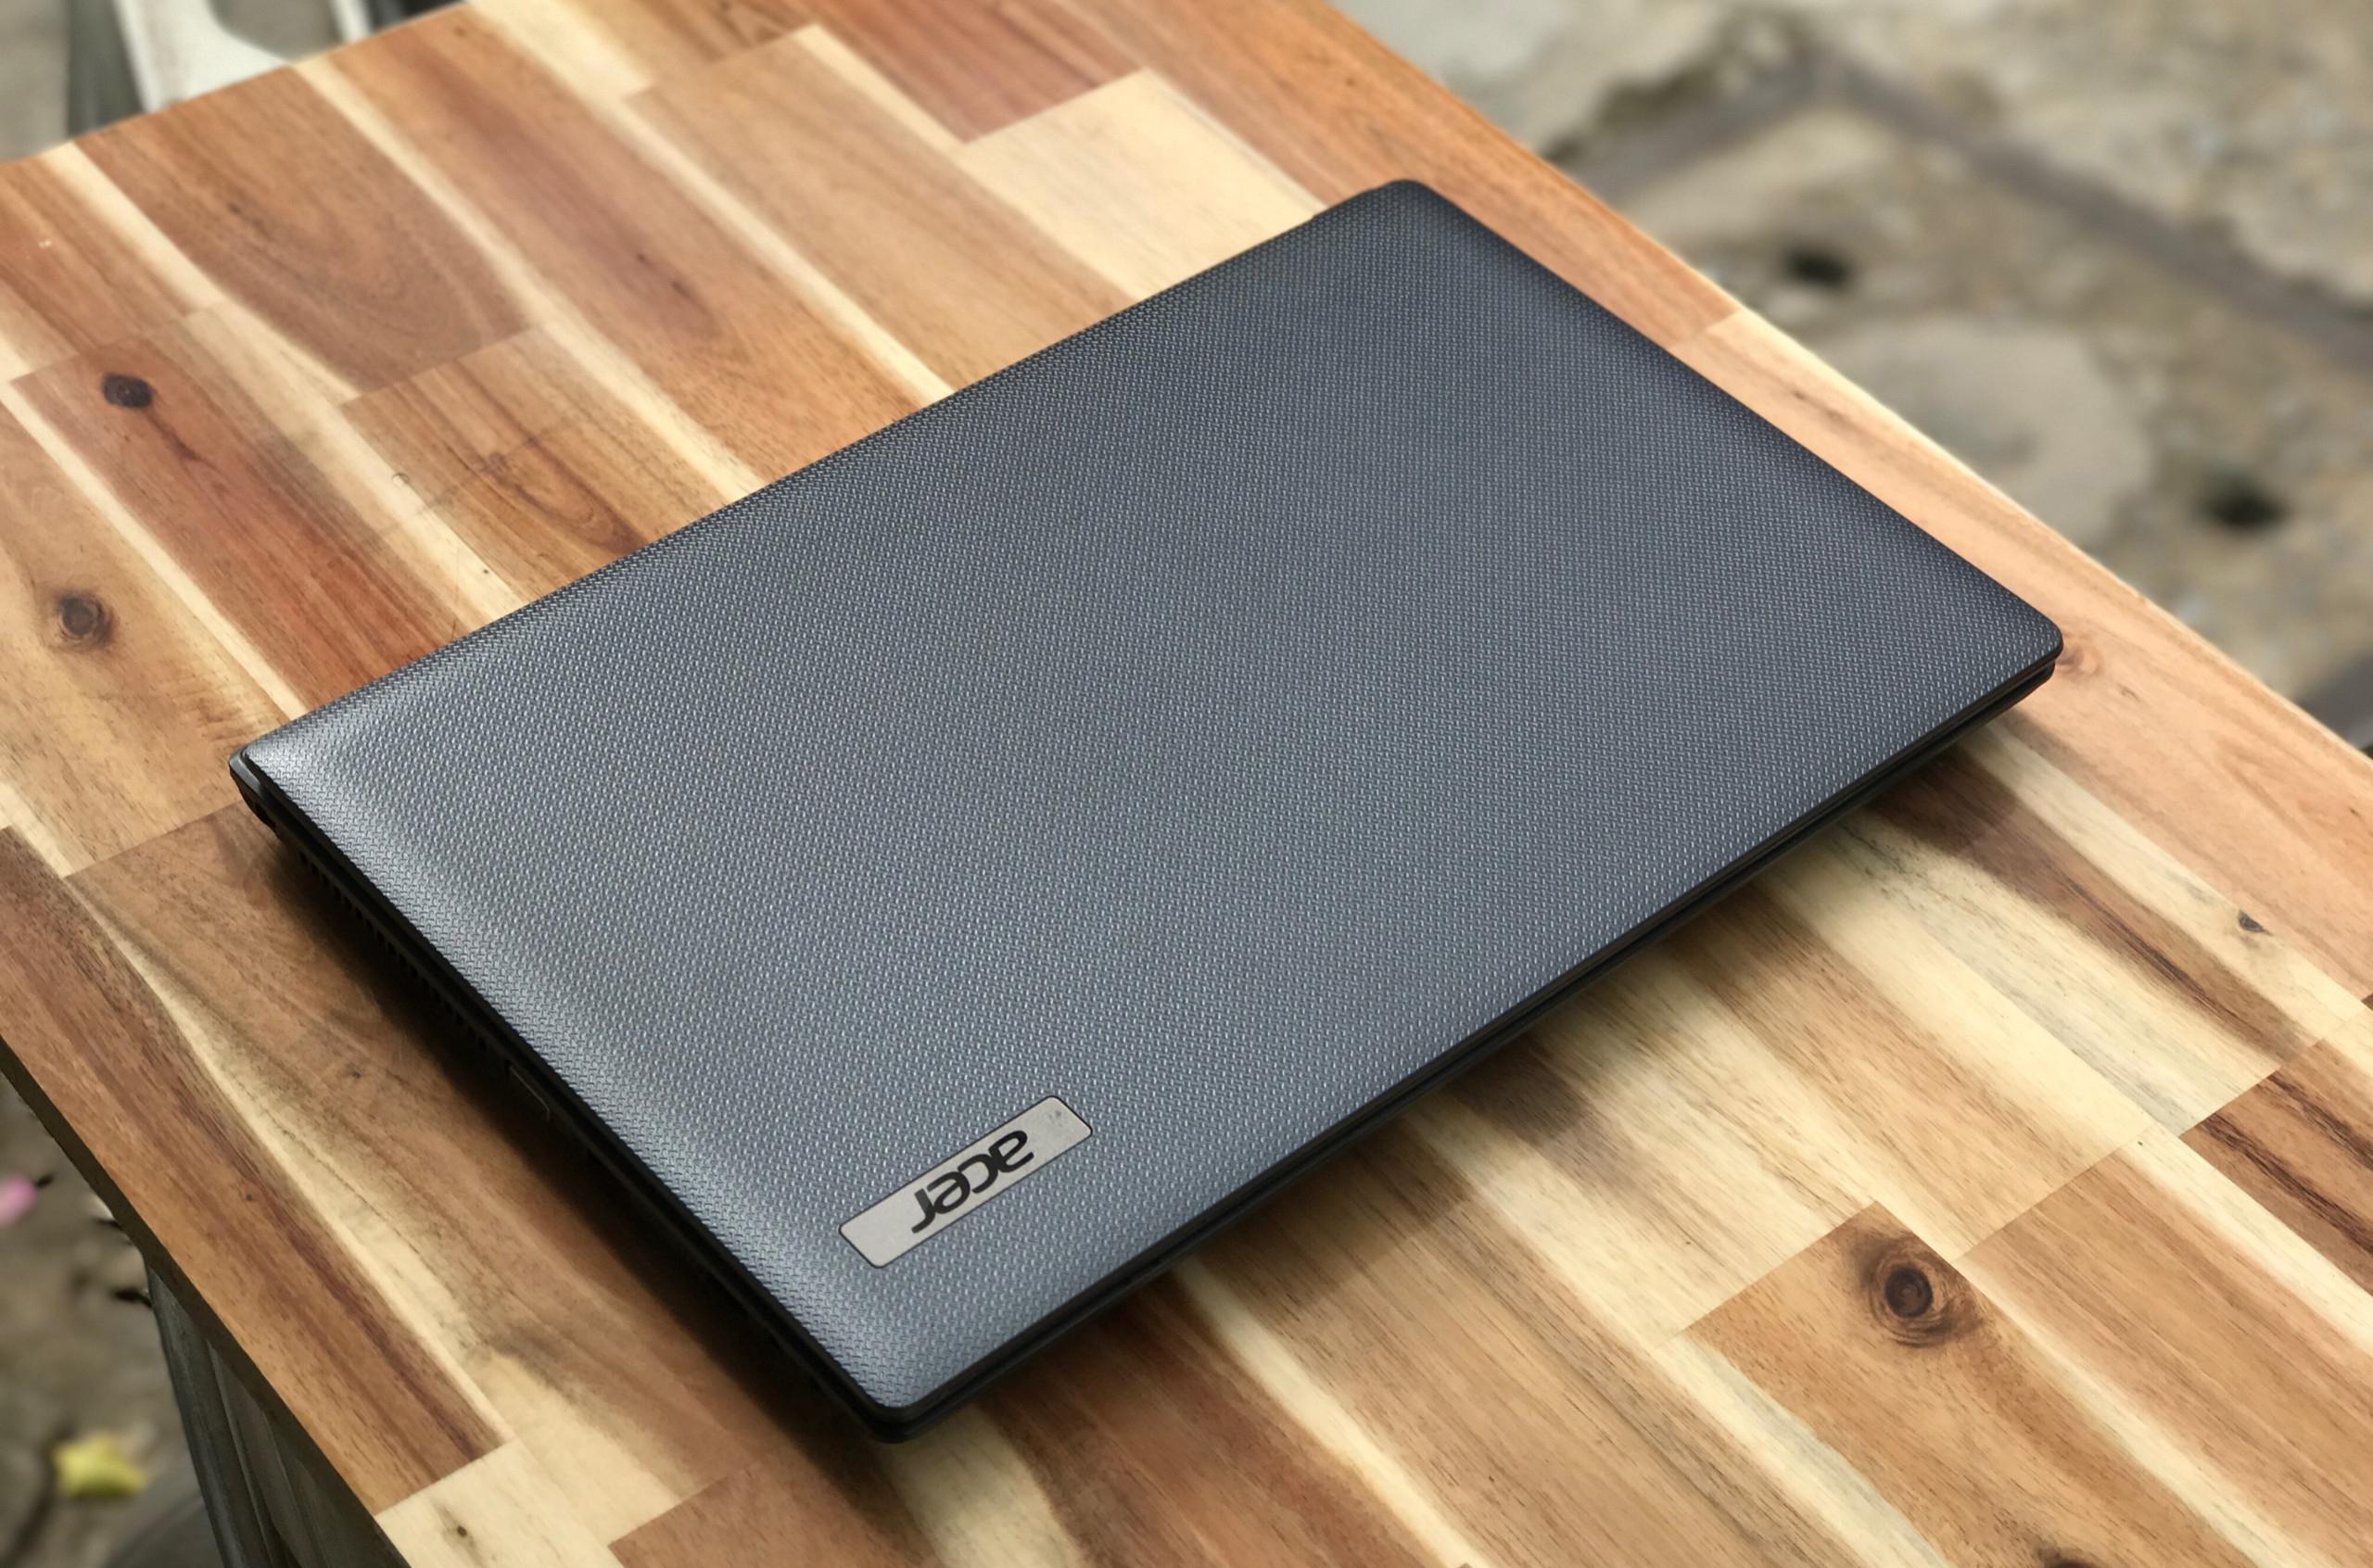 Laptop Acer 5250, AMD E-350 4G 500GB, Đẹp